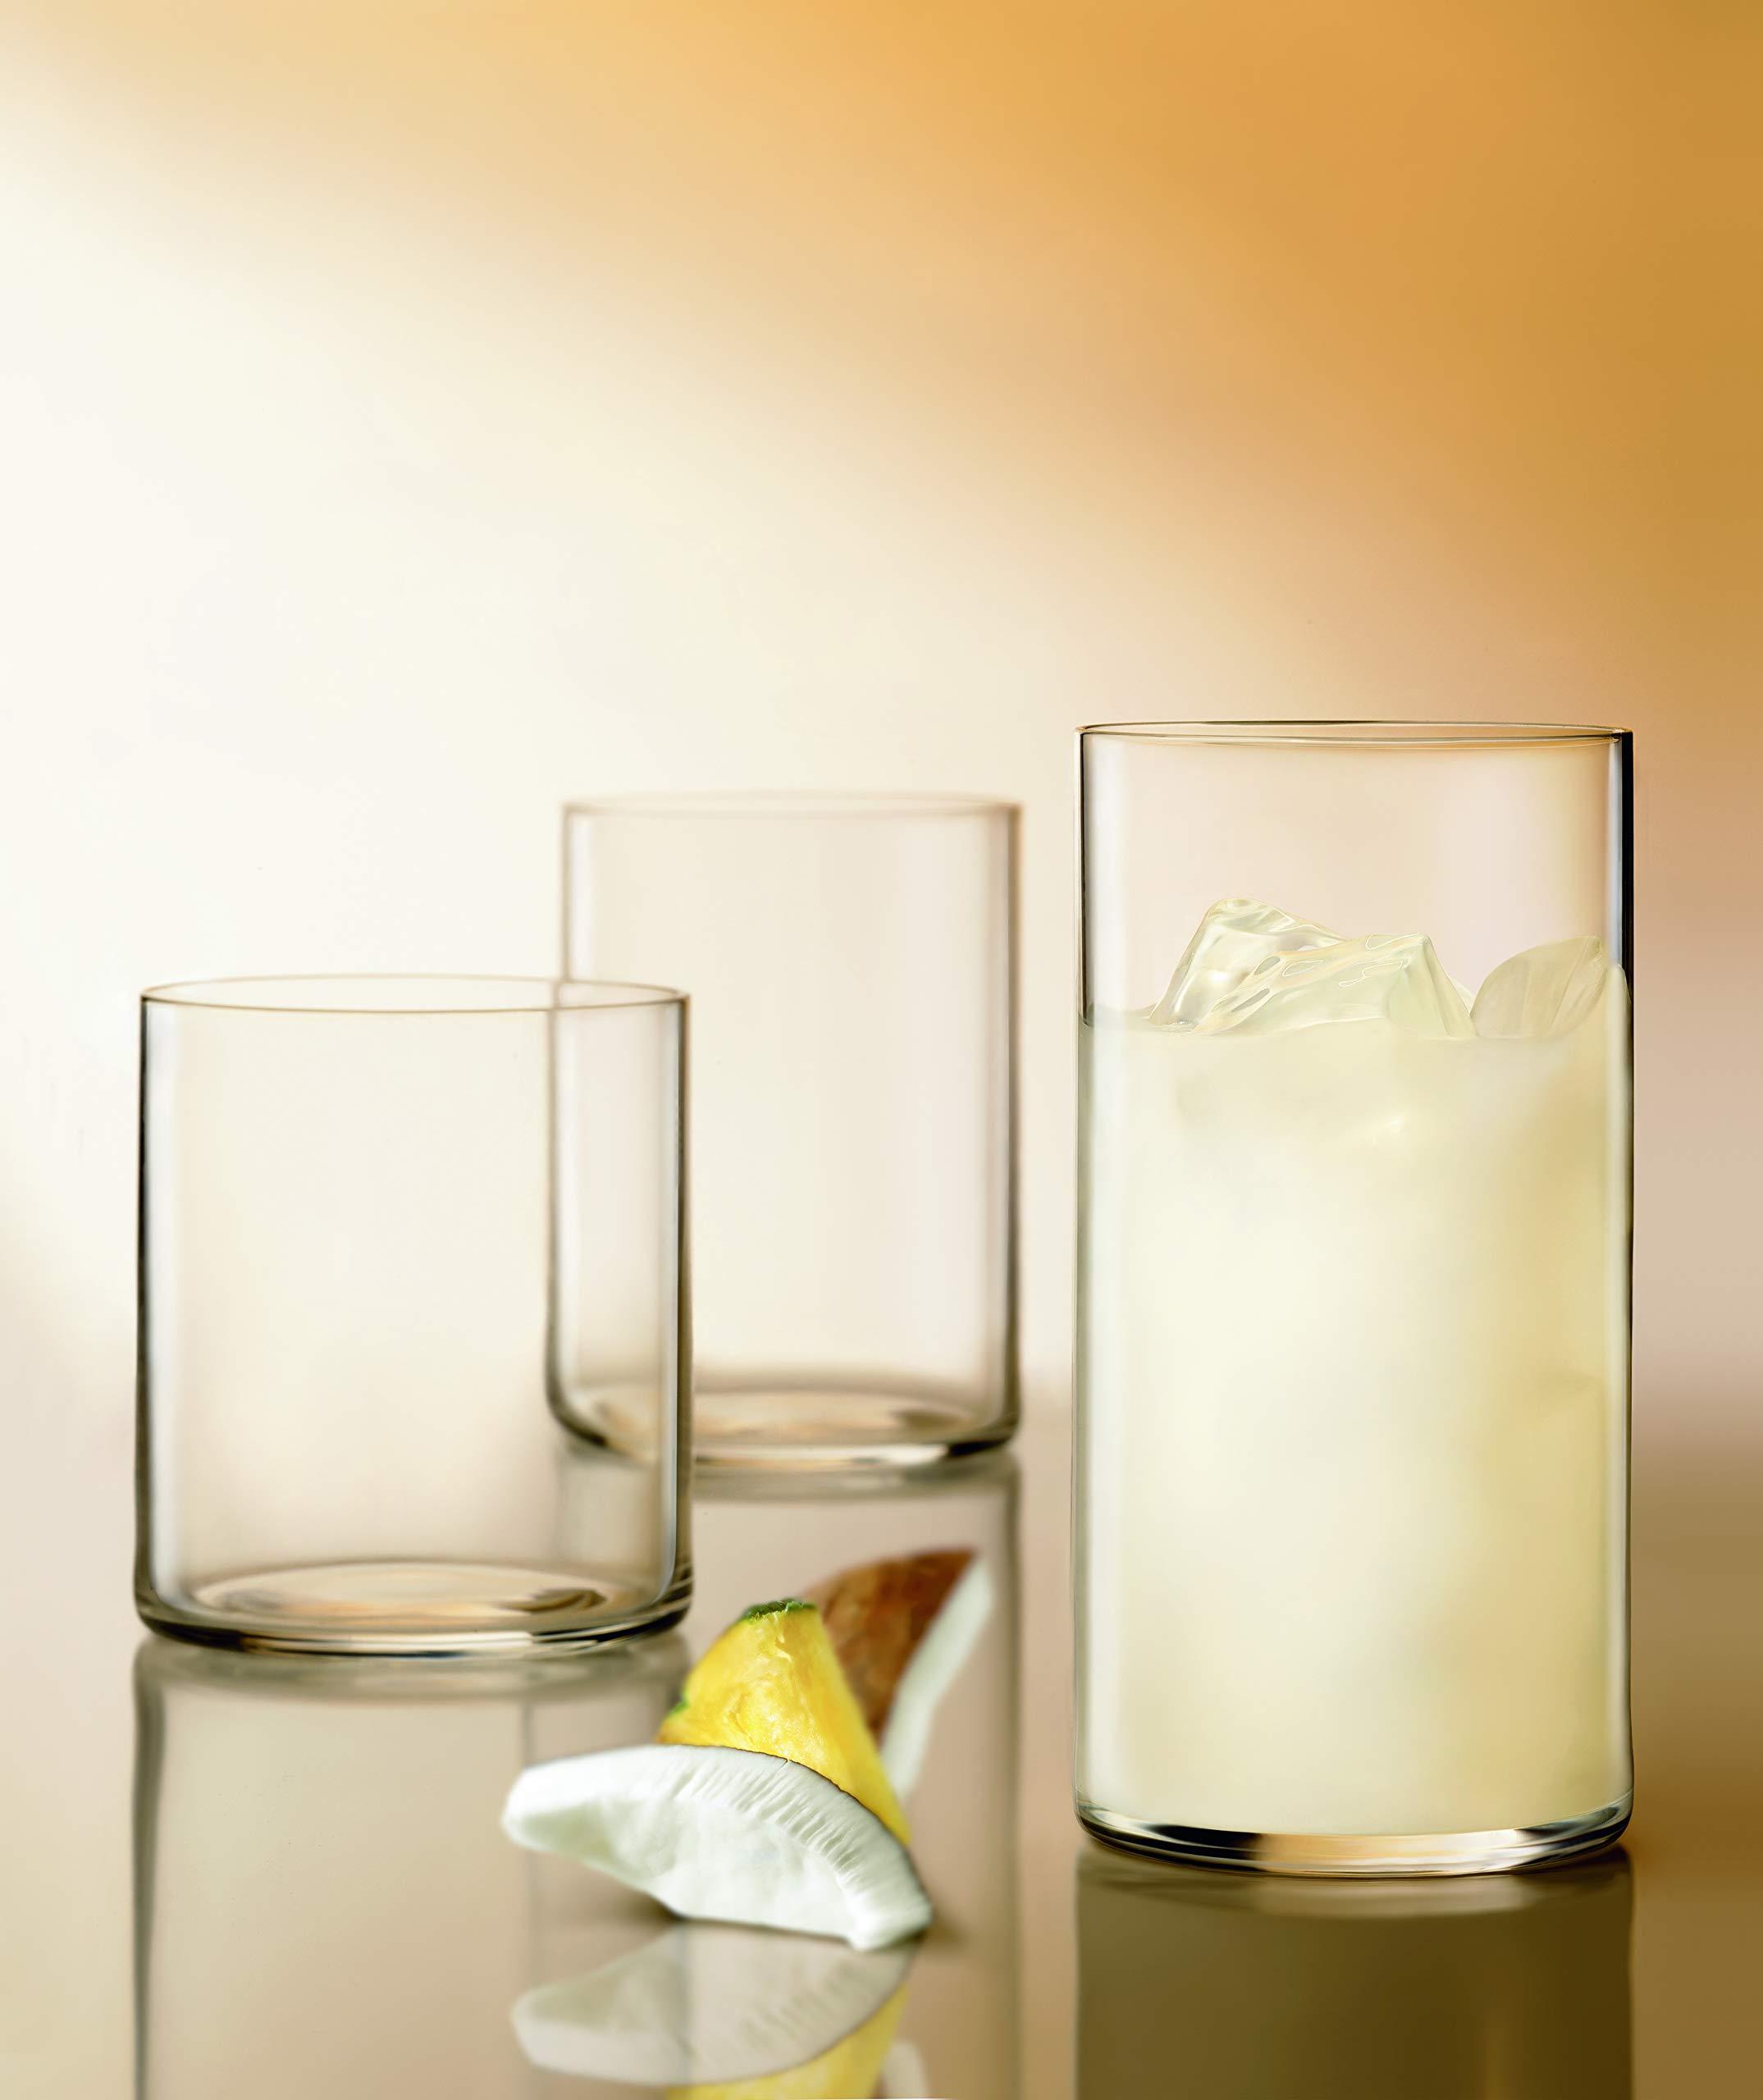 Luigi Bormioli 12634/01 Top Class 12.25 oz Beverage Glasses, Set of 6, Clear by Luigi Bormioli